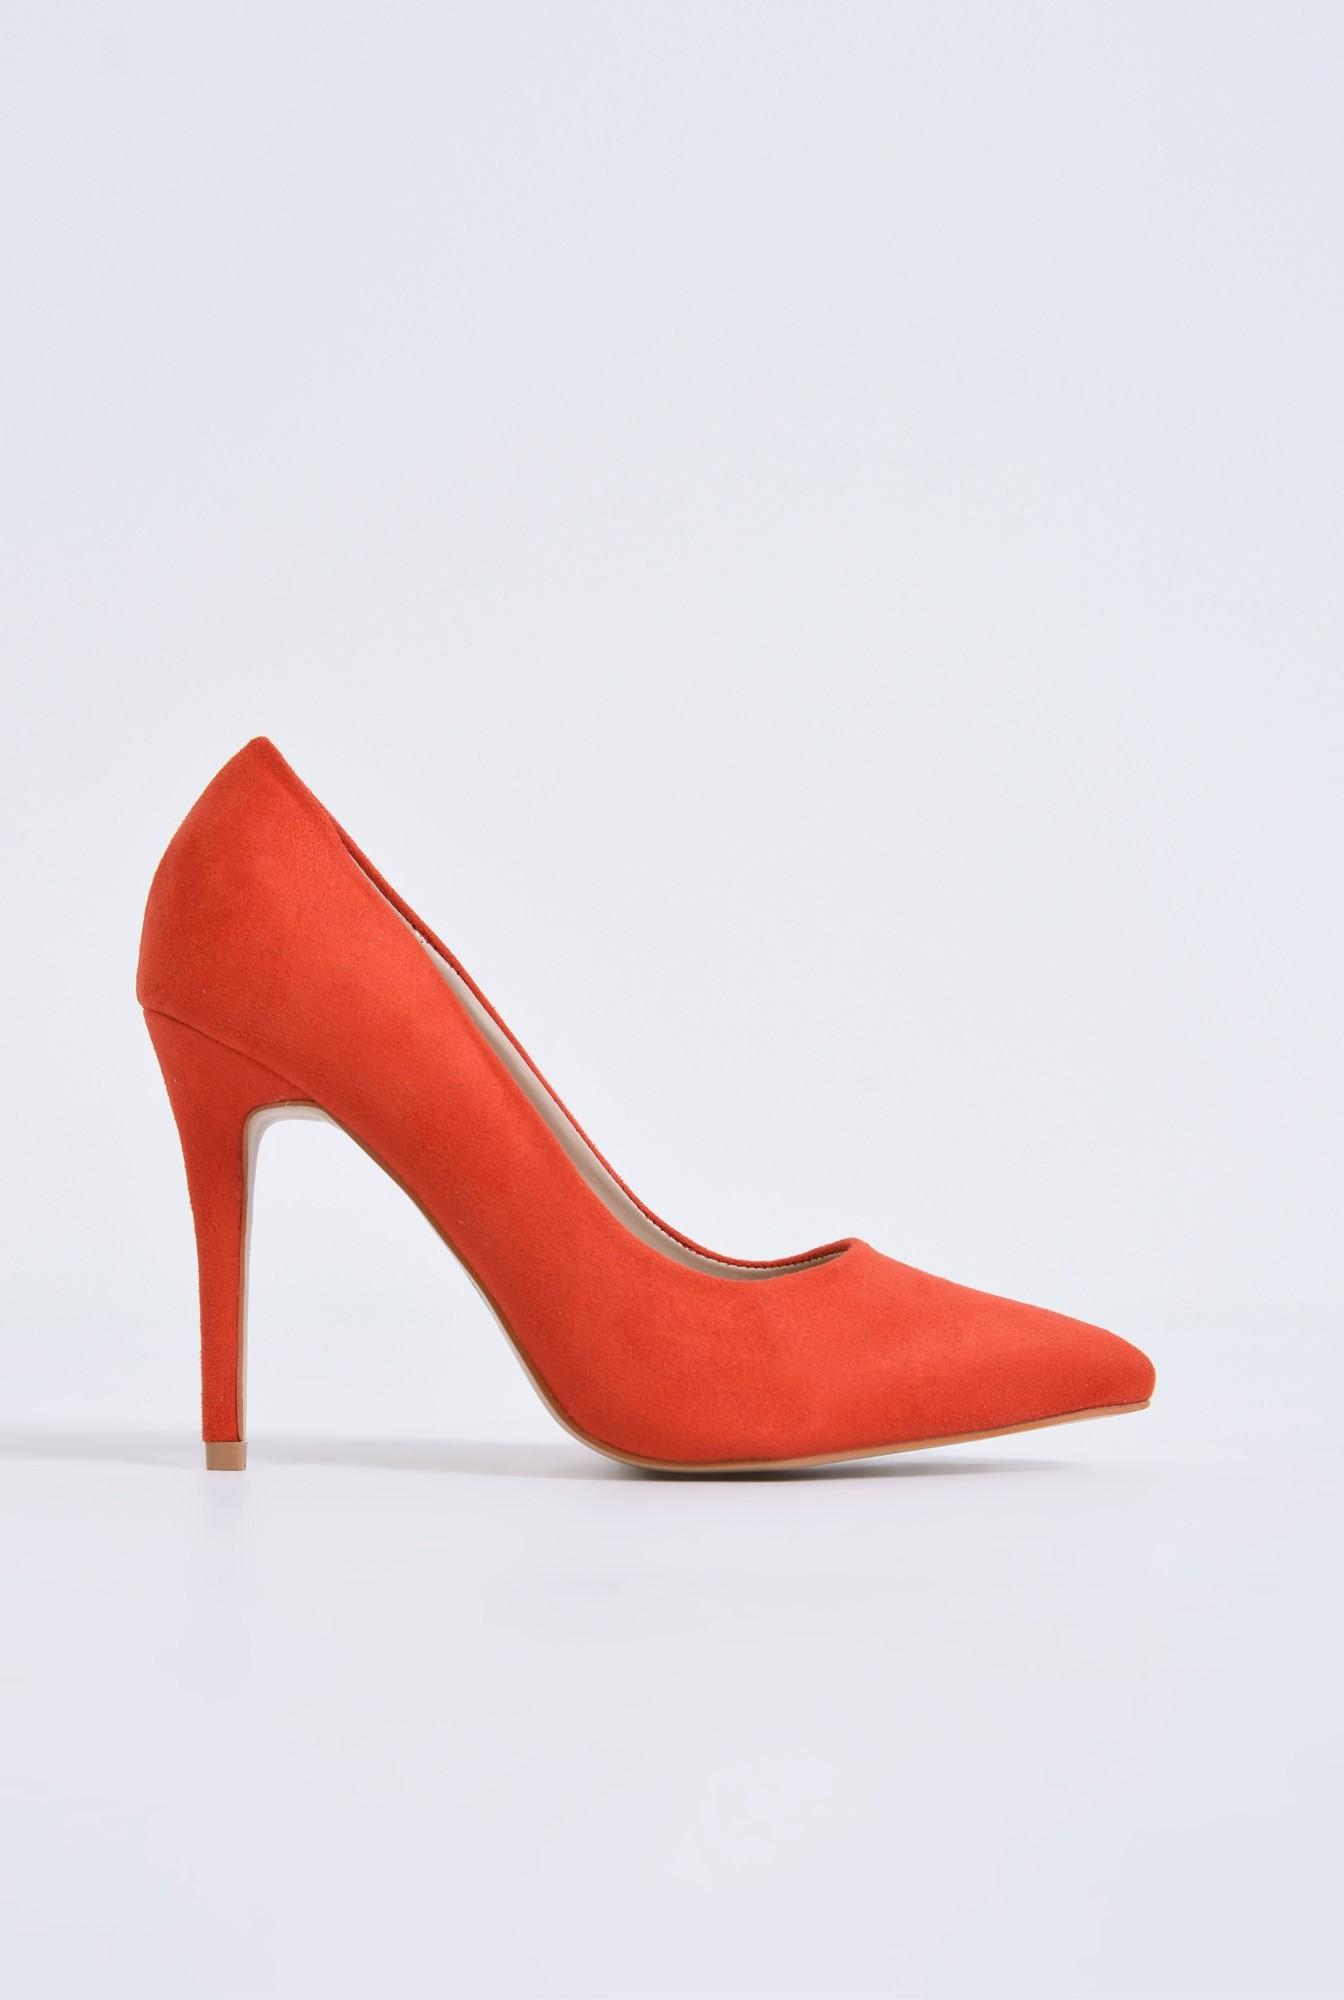 0 - pantofi casual, rosu, stiletto